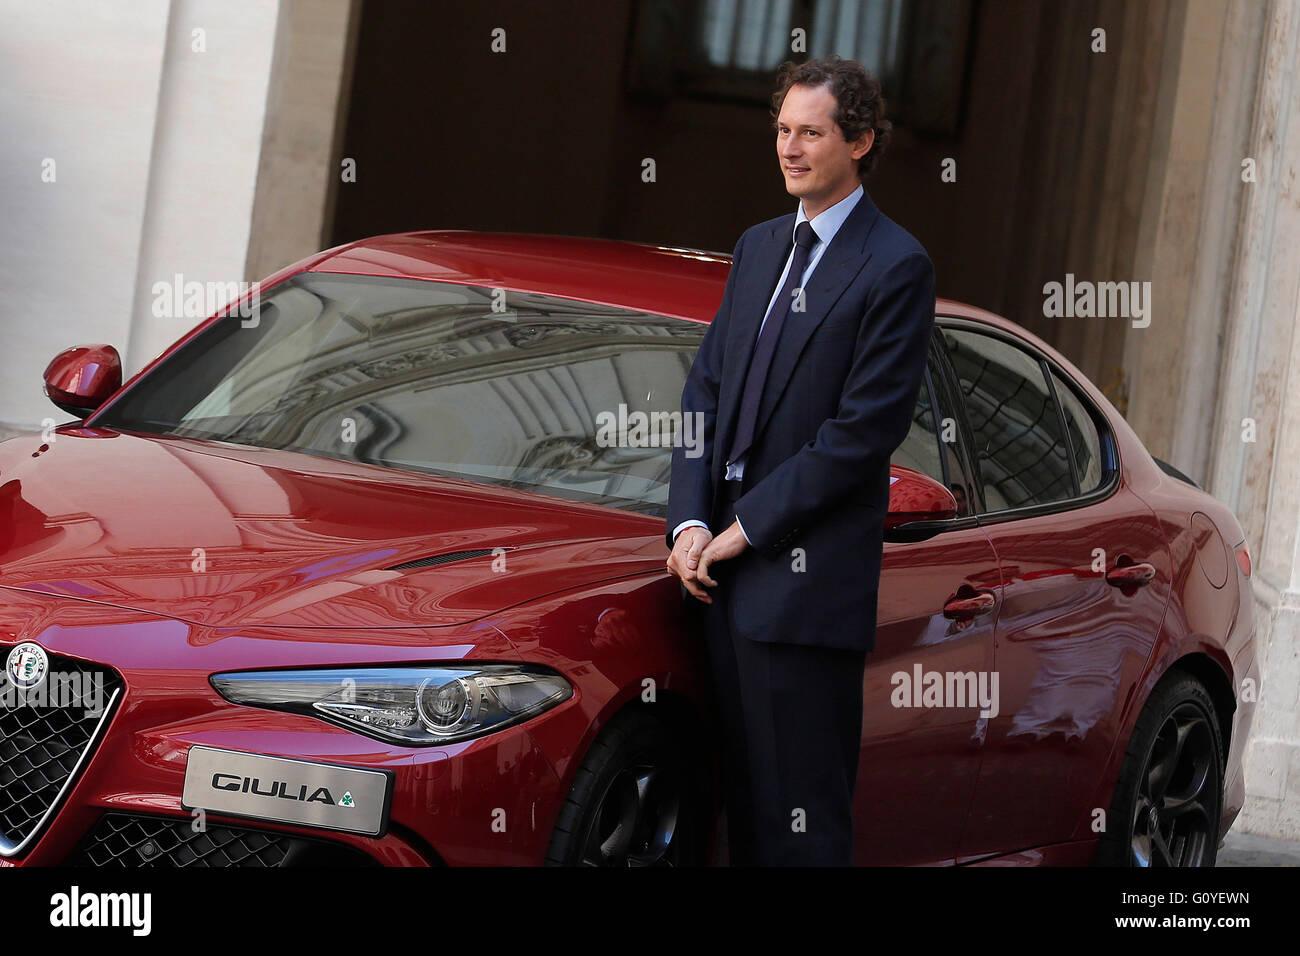 Rome, Italy. 5th May, 2016. John Elkann, President of Fiat Chrysler Automobiles Rome 5th May 2016. Presentation Stock Photo